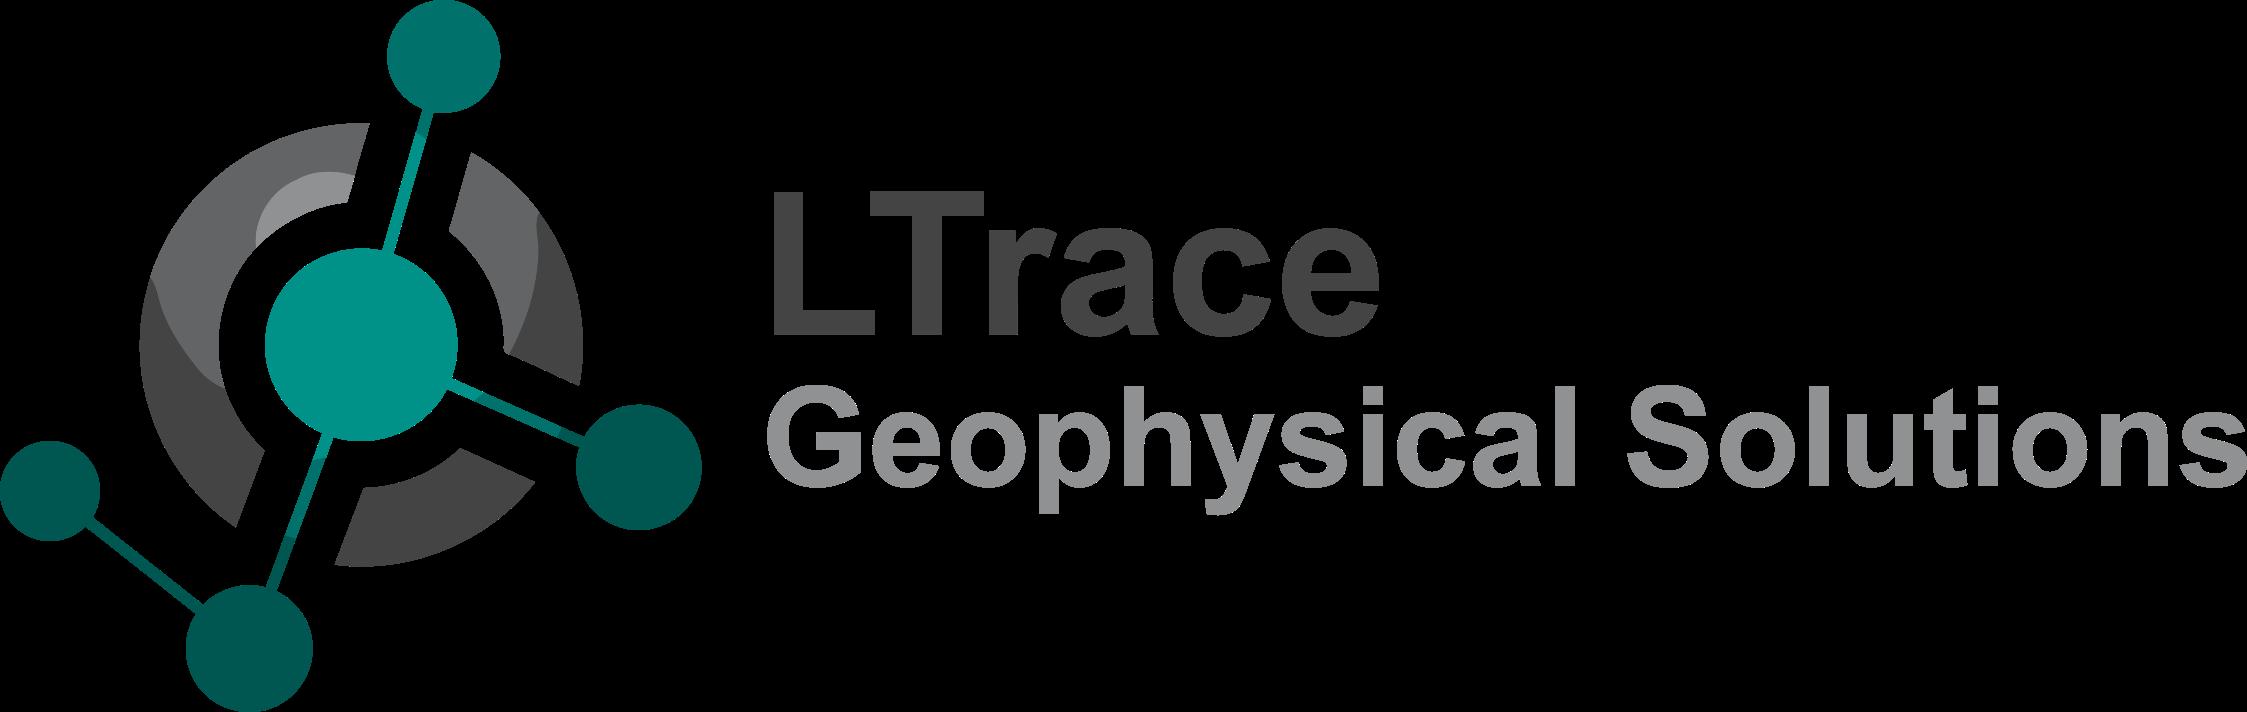 Ltrace logo ingles